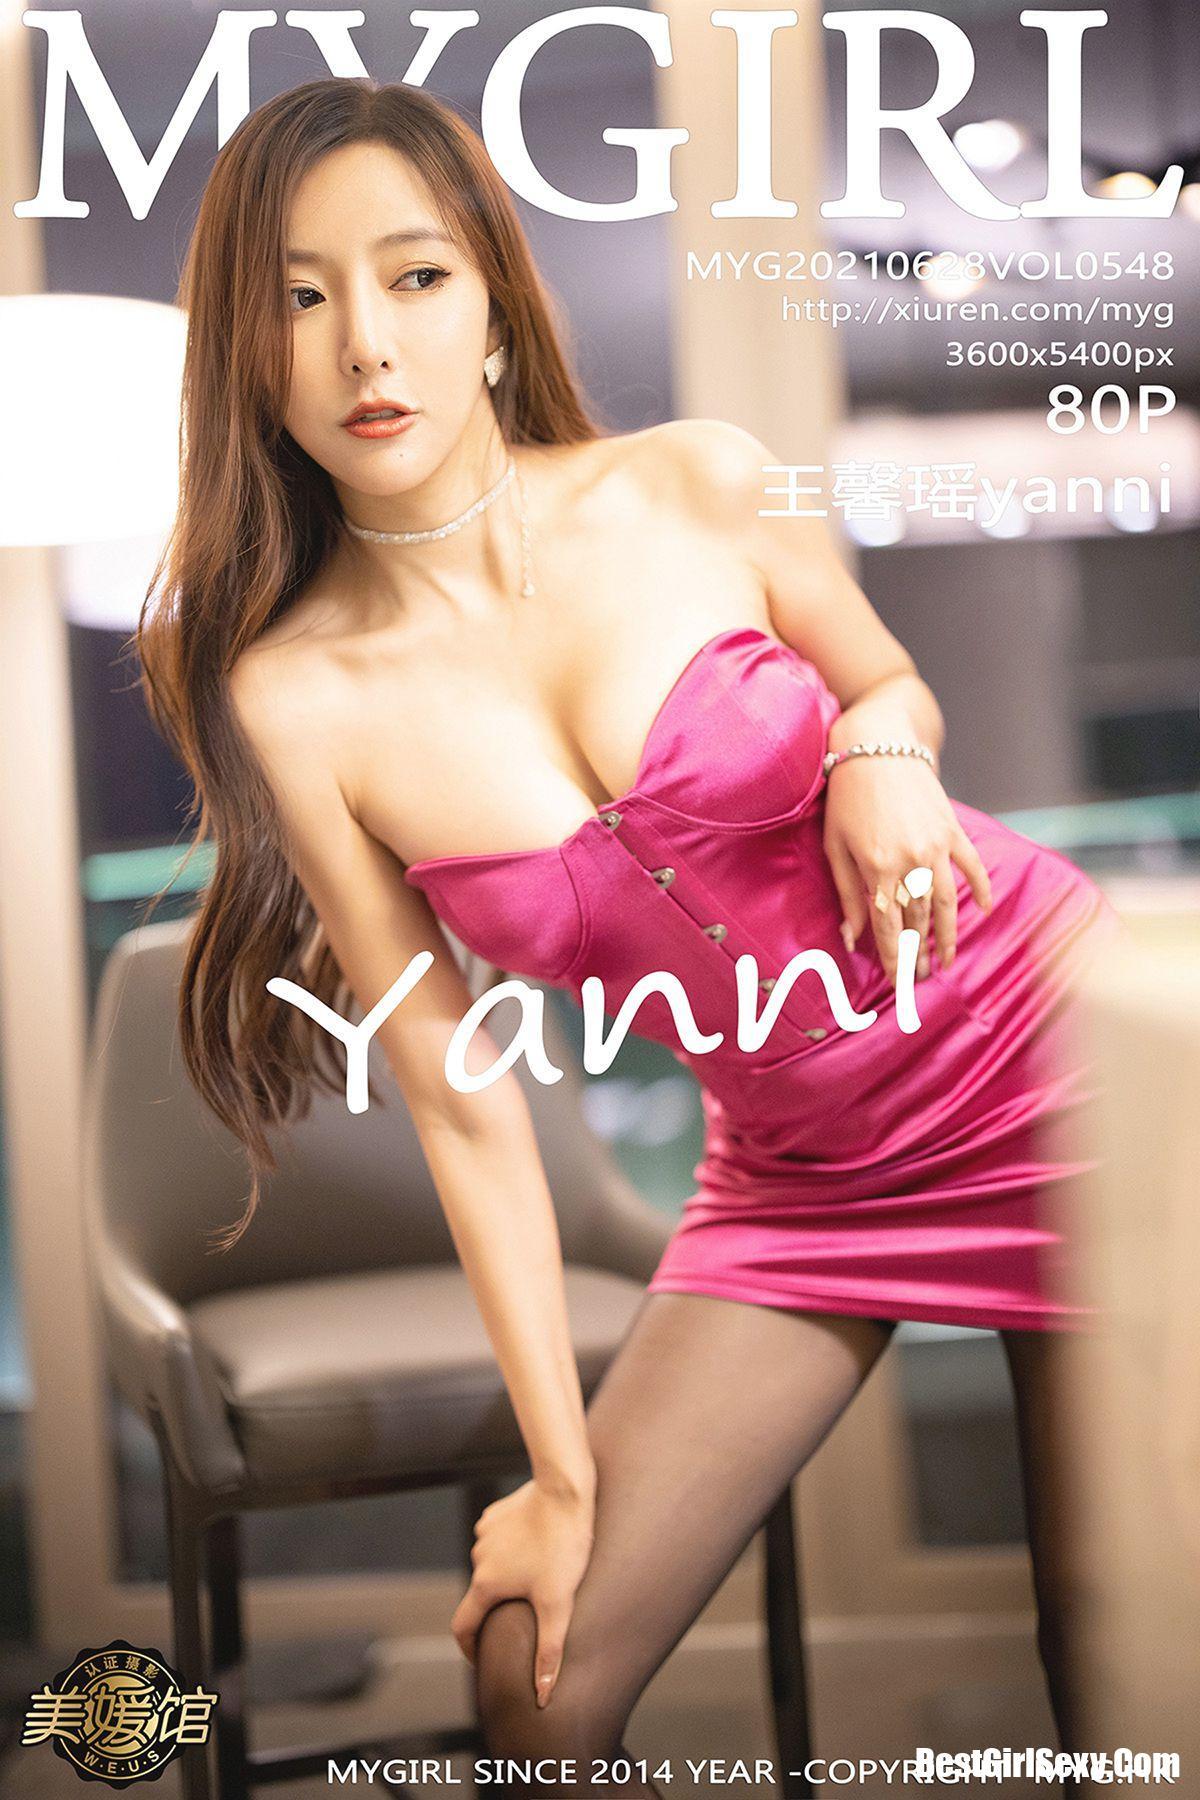 MyGirl美媛馆 Vol.548 Wang Xin Yao 1